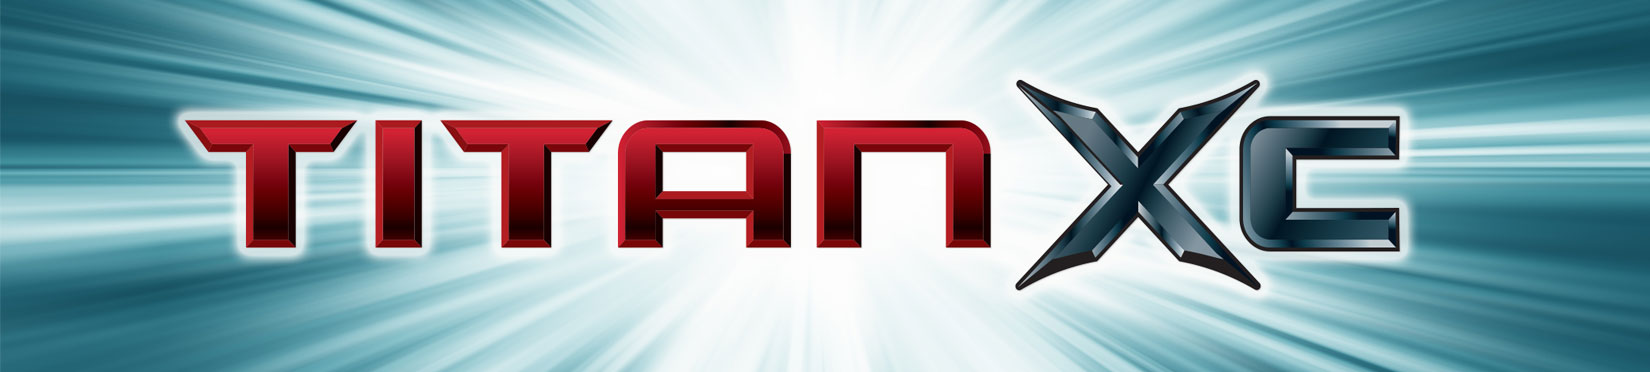 TITAN XC Banner